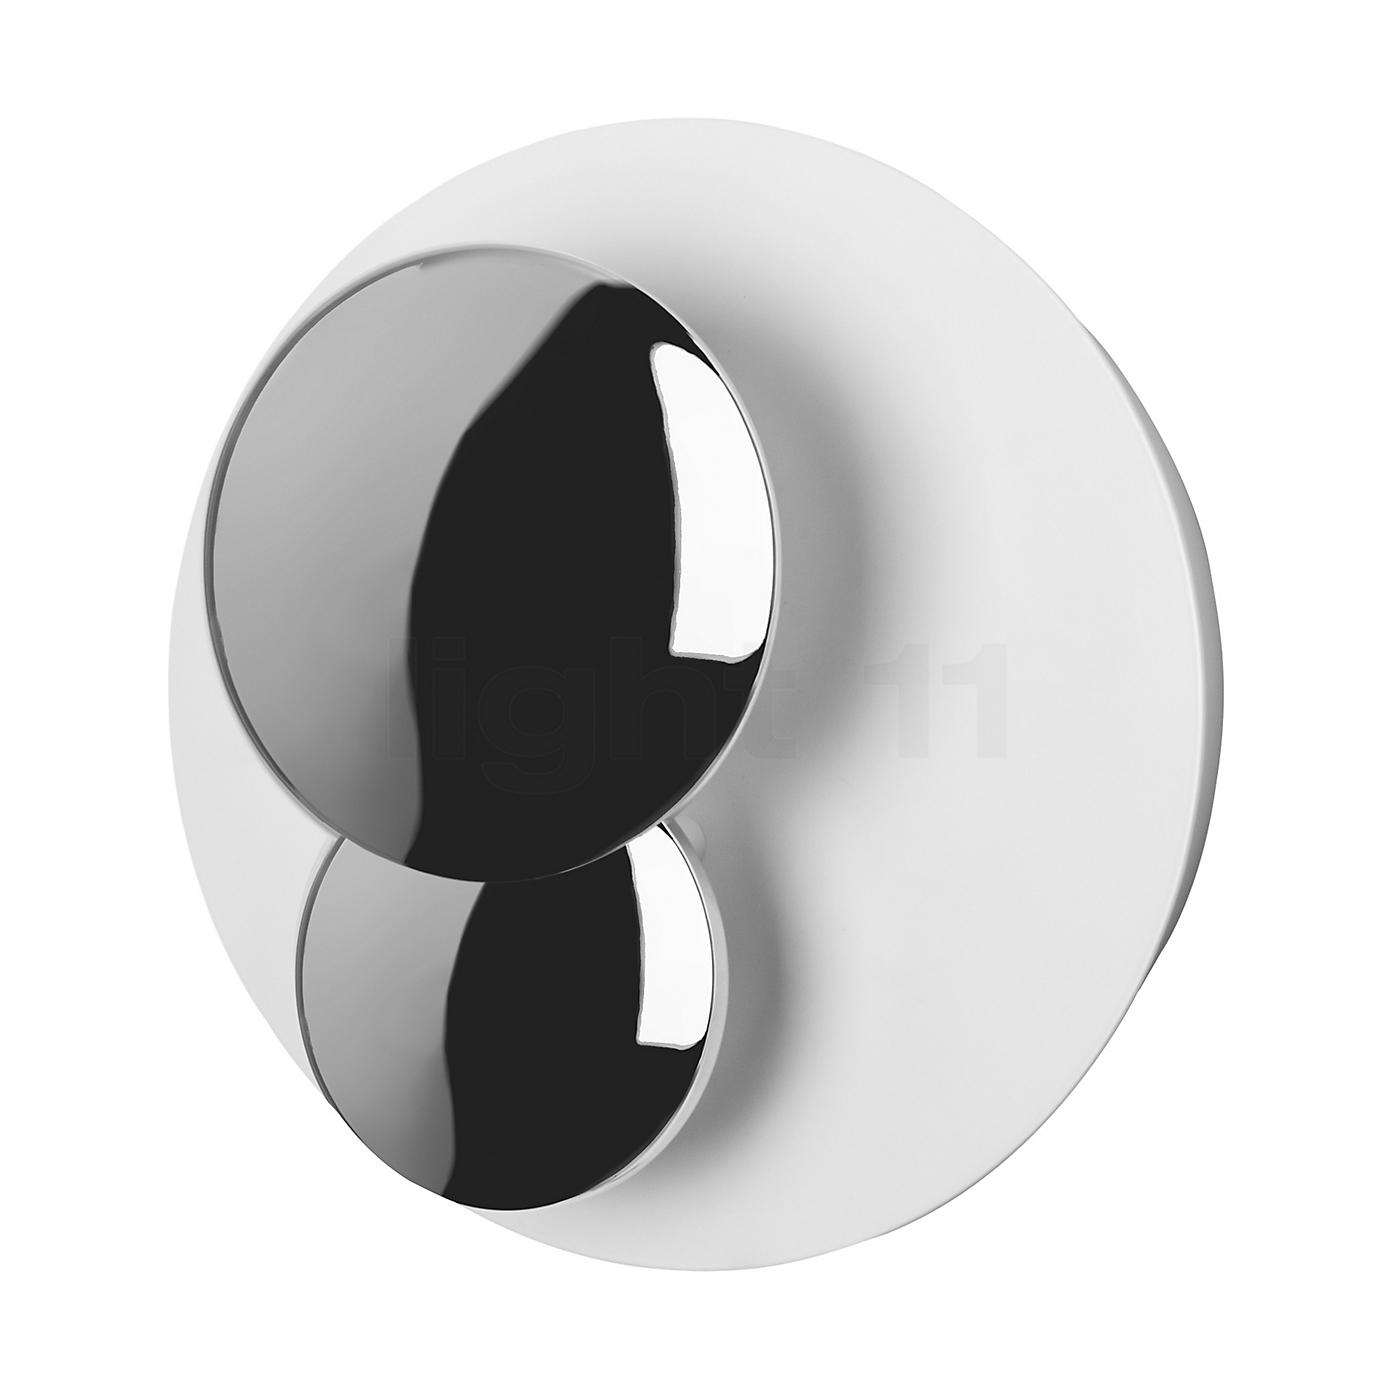 leds c4 strata wandleuchte dimmbar led wandleuchte kaufen bei. Black Bedroom Furniture Sets. Home Design Ideas